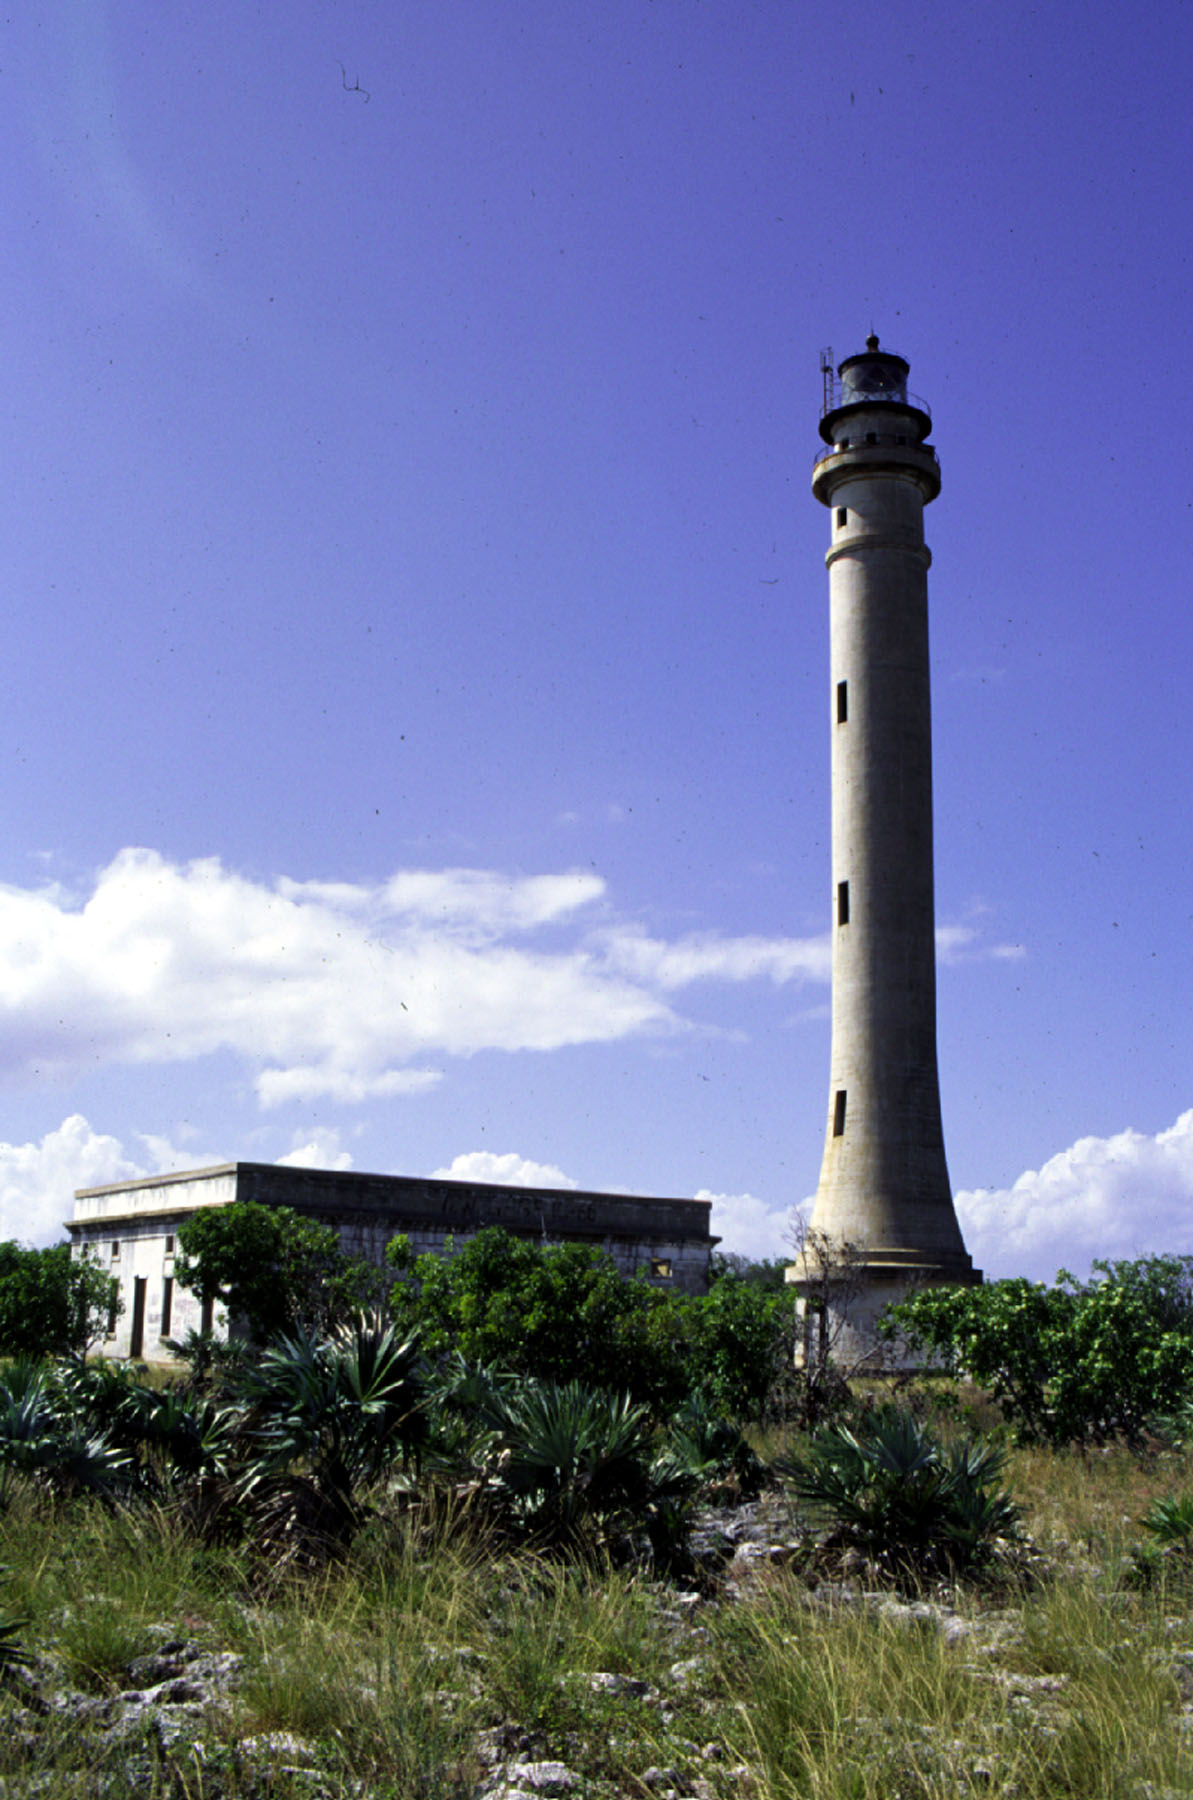 Faro de Navaza -Navassa Lighthouse- ¿Haití o EE. UU.?